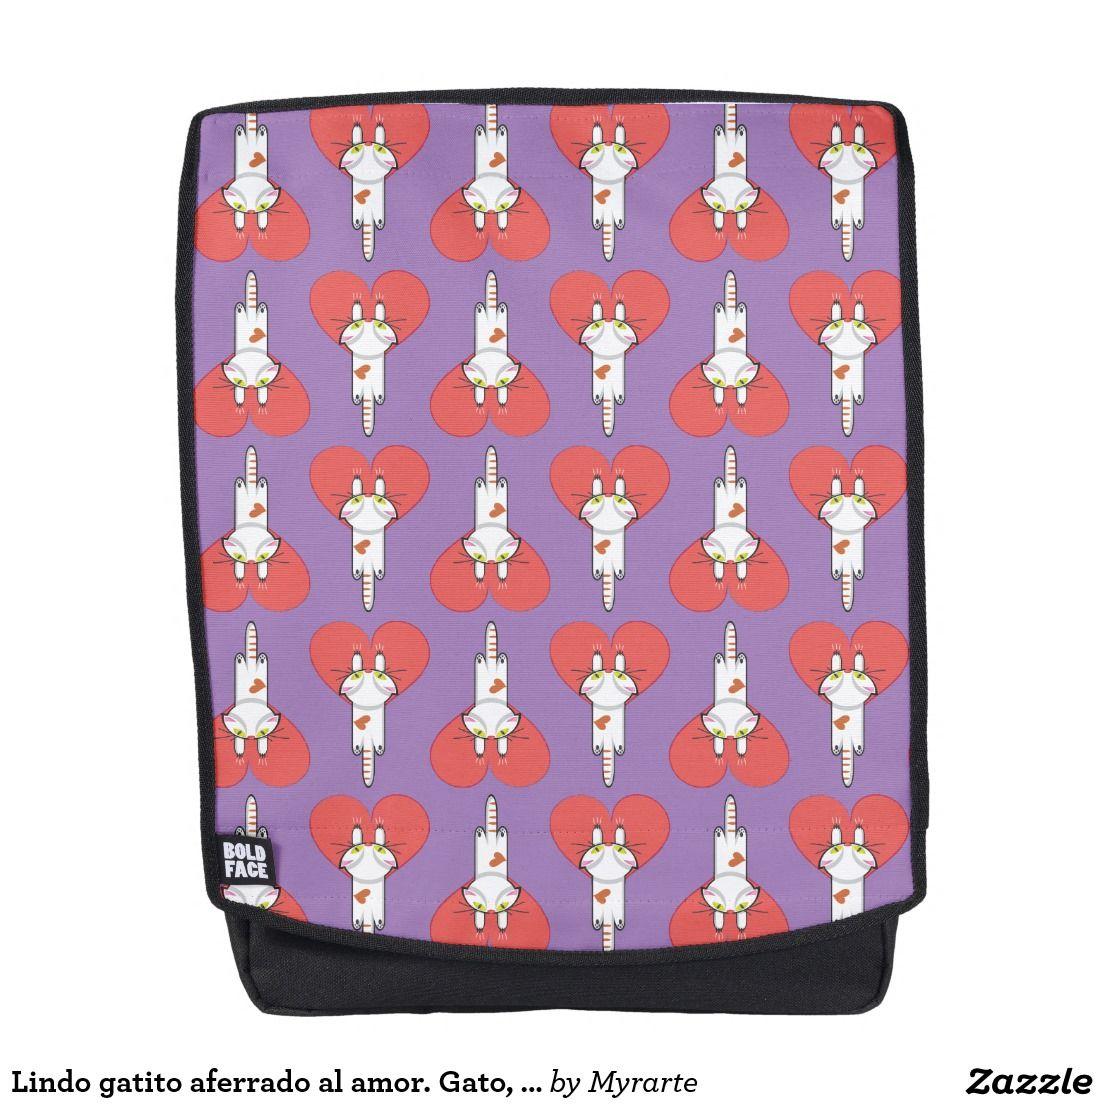 Lindo gatito aferrado al amor. Gato, cat, kitten. Producto disponible en tienda Zazzle. Accesorios, moda. Product available in Zazzle store. Fashion Accessories. Regalos, Gifts. Link to product: http://www.zazzle.com/lindo_gatito_aferrado_al_amor_gato_cat_kitten_backpack-256701675471627094?CMPN=shareicon&lang=en&social=true&rf=238167879144476949 #mochila #backpack #gato #cat #kitten